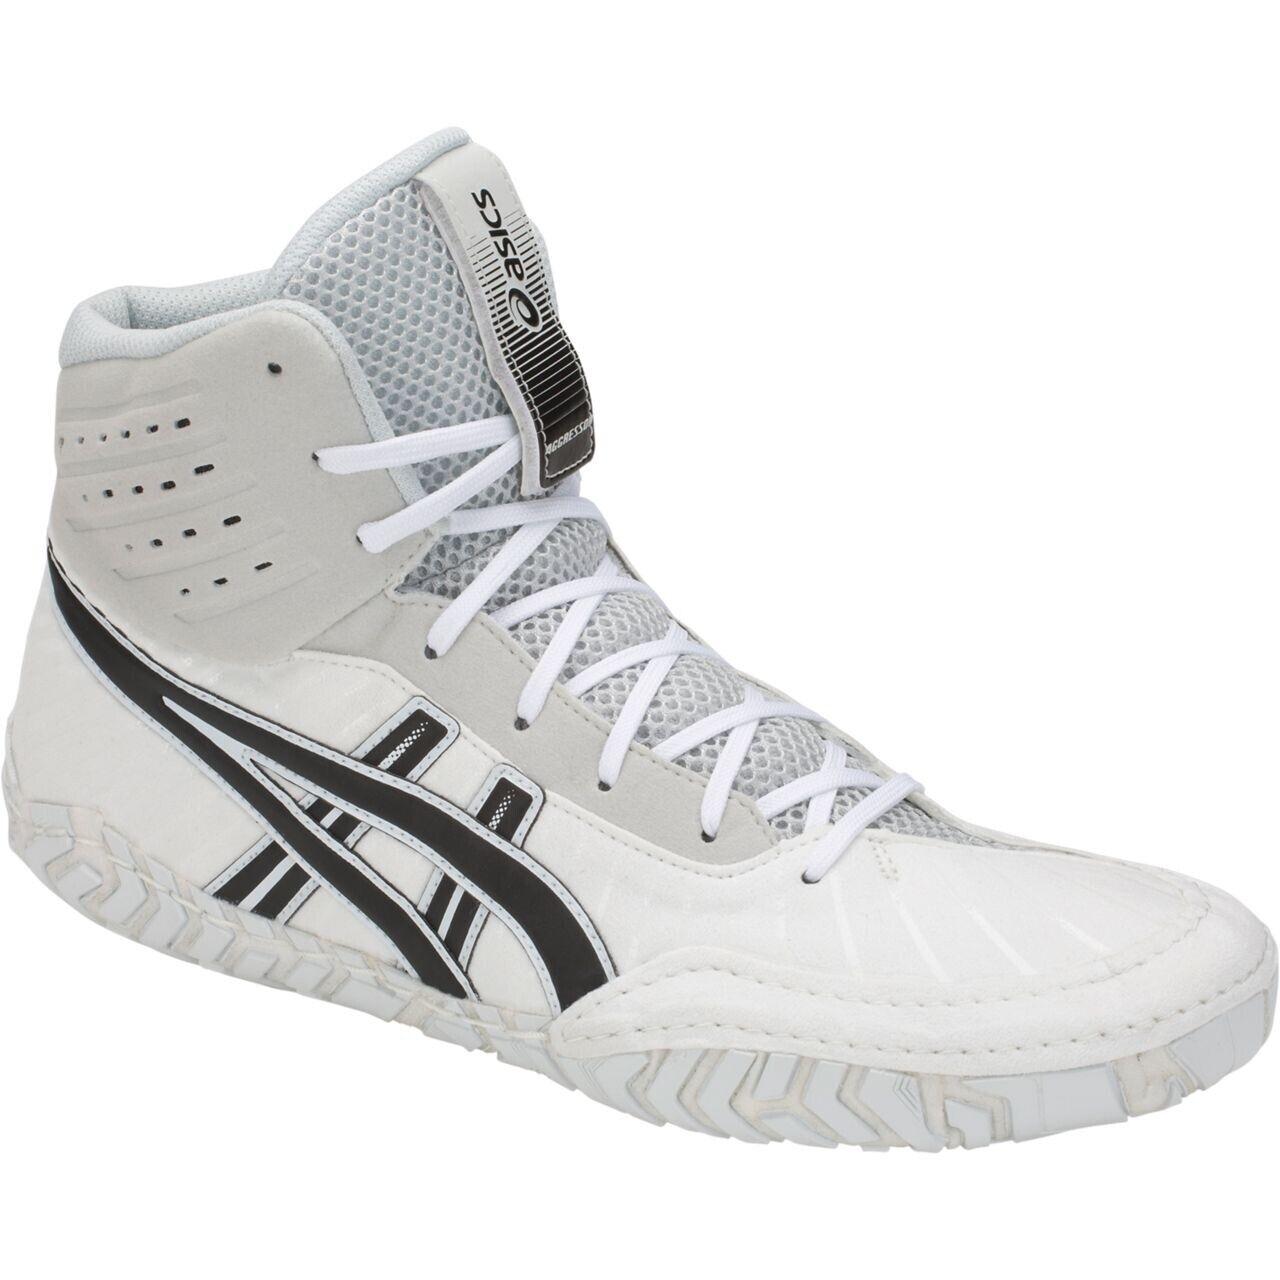 ASICS Aggressor 4 Zapato-lucha De Hombre-blancoo - 1081A001.100